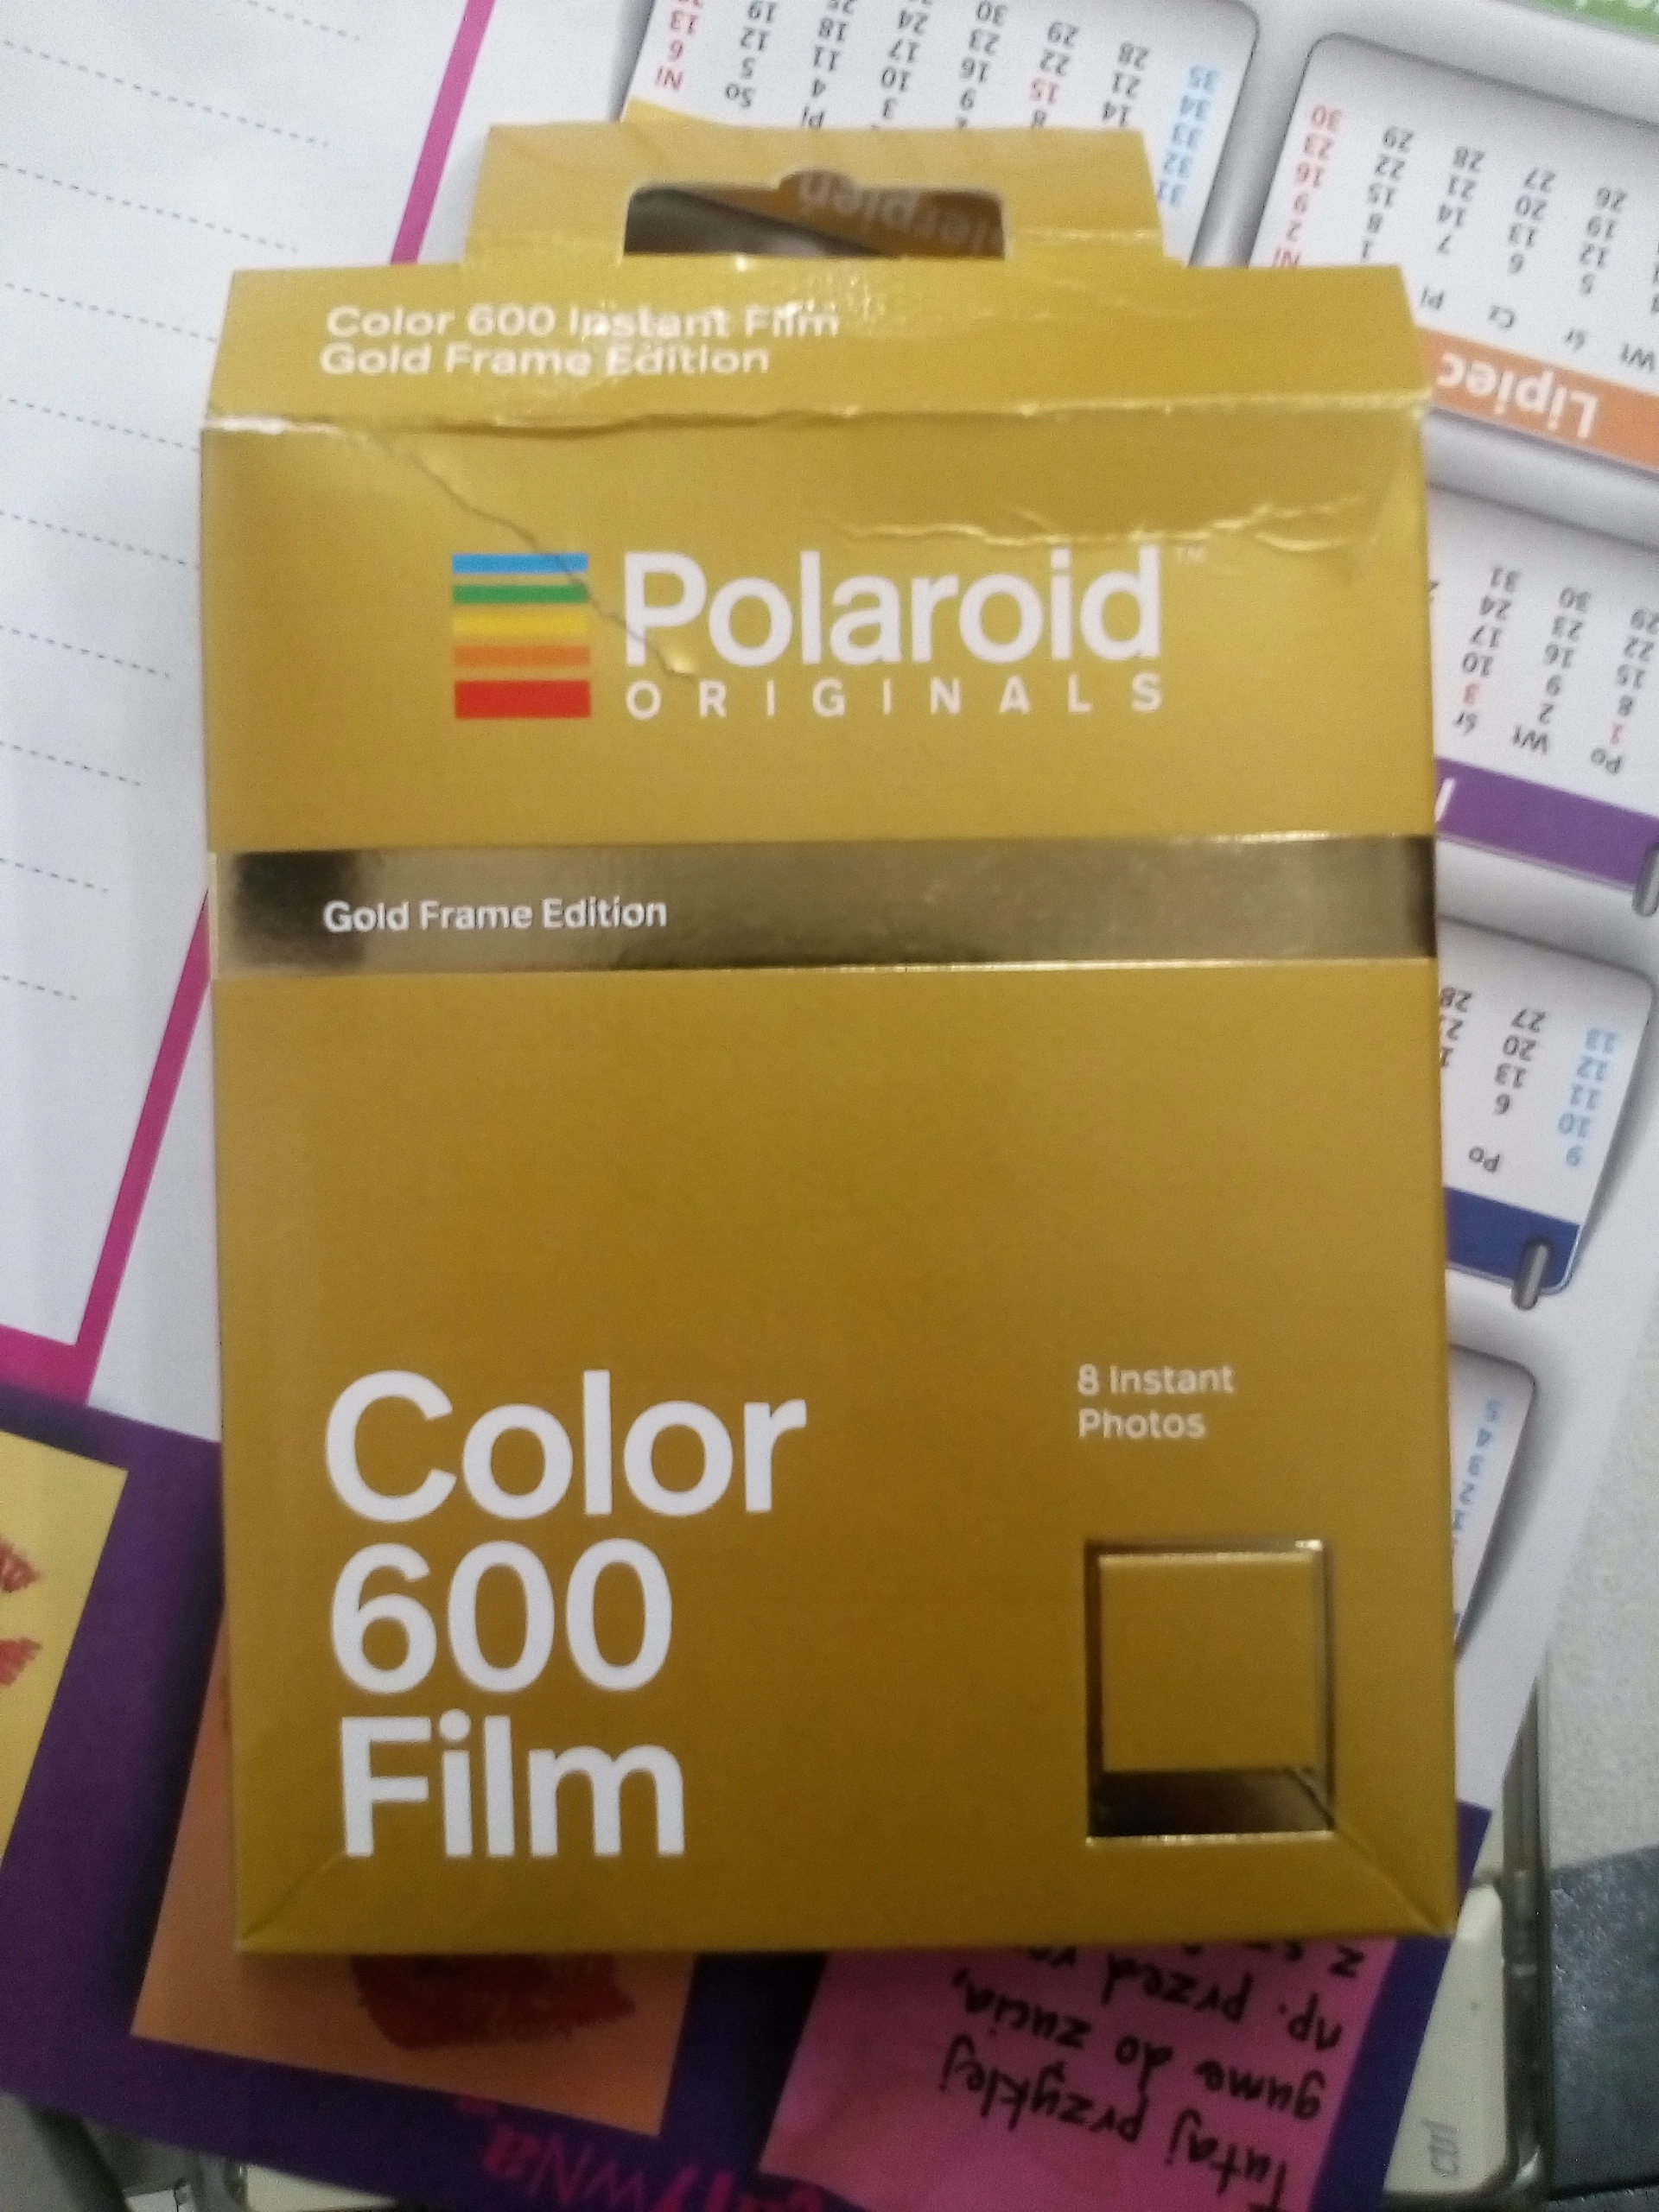 polaroid film golden frame edition złota ramka